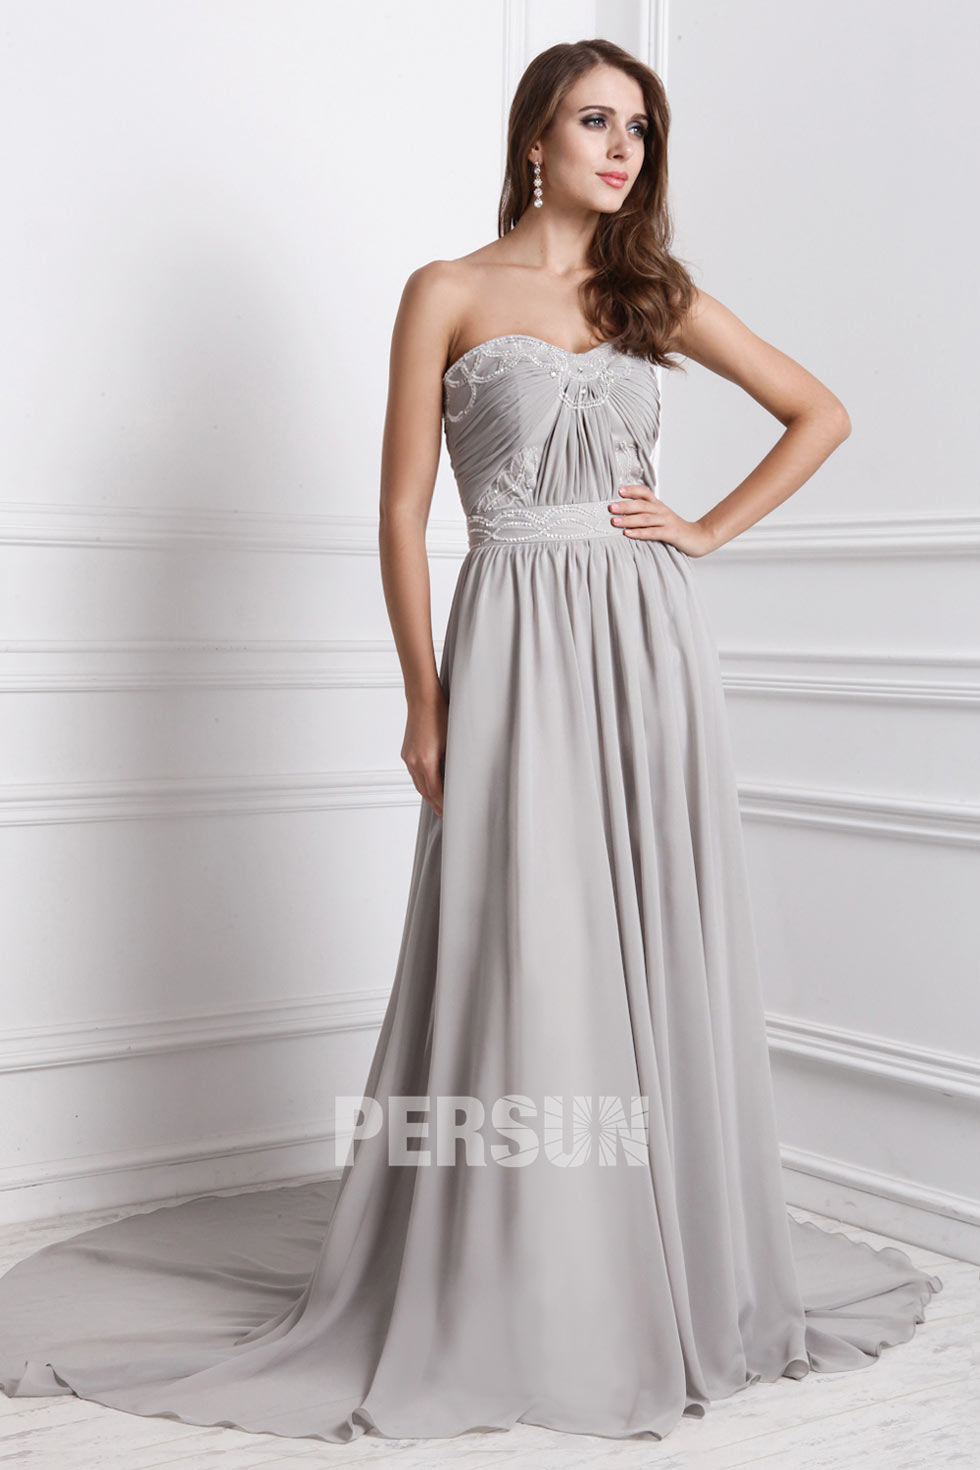 robe de soirée chic en ton gris avec tra?ne chapel